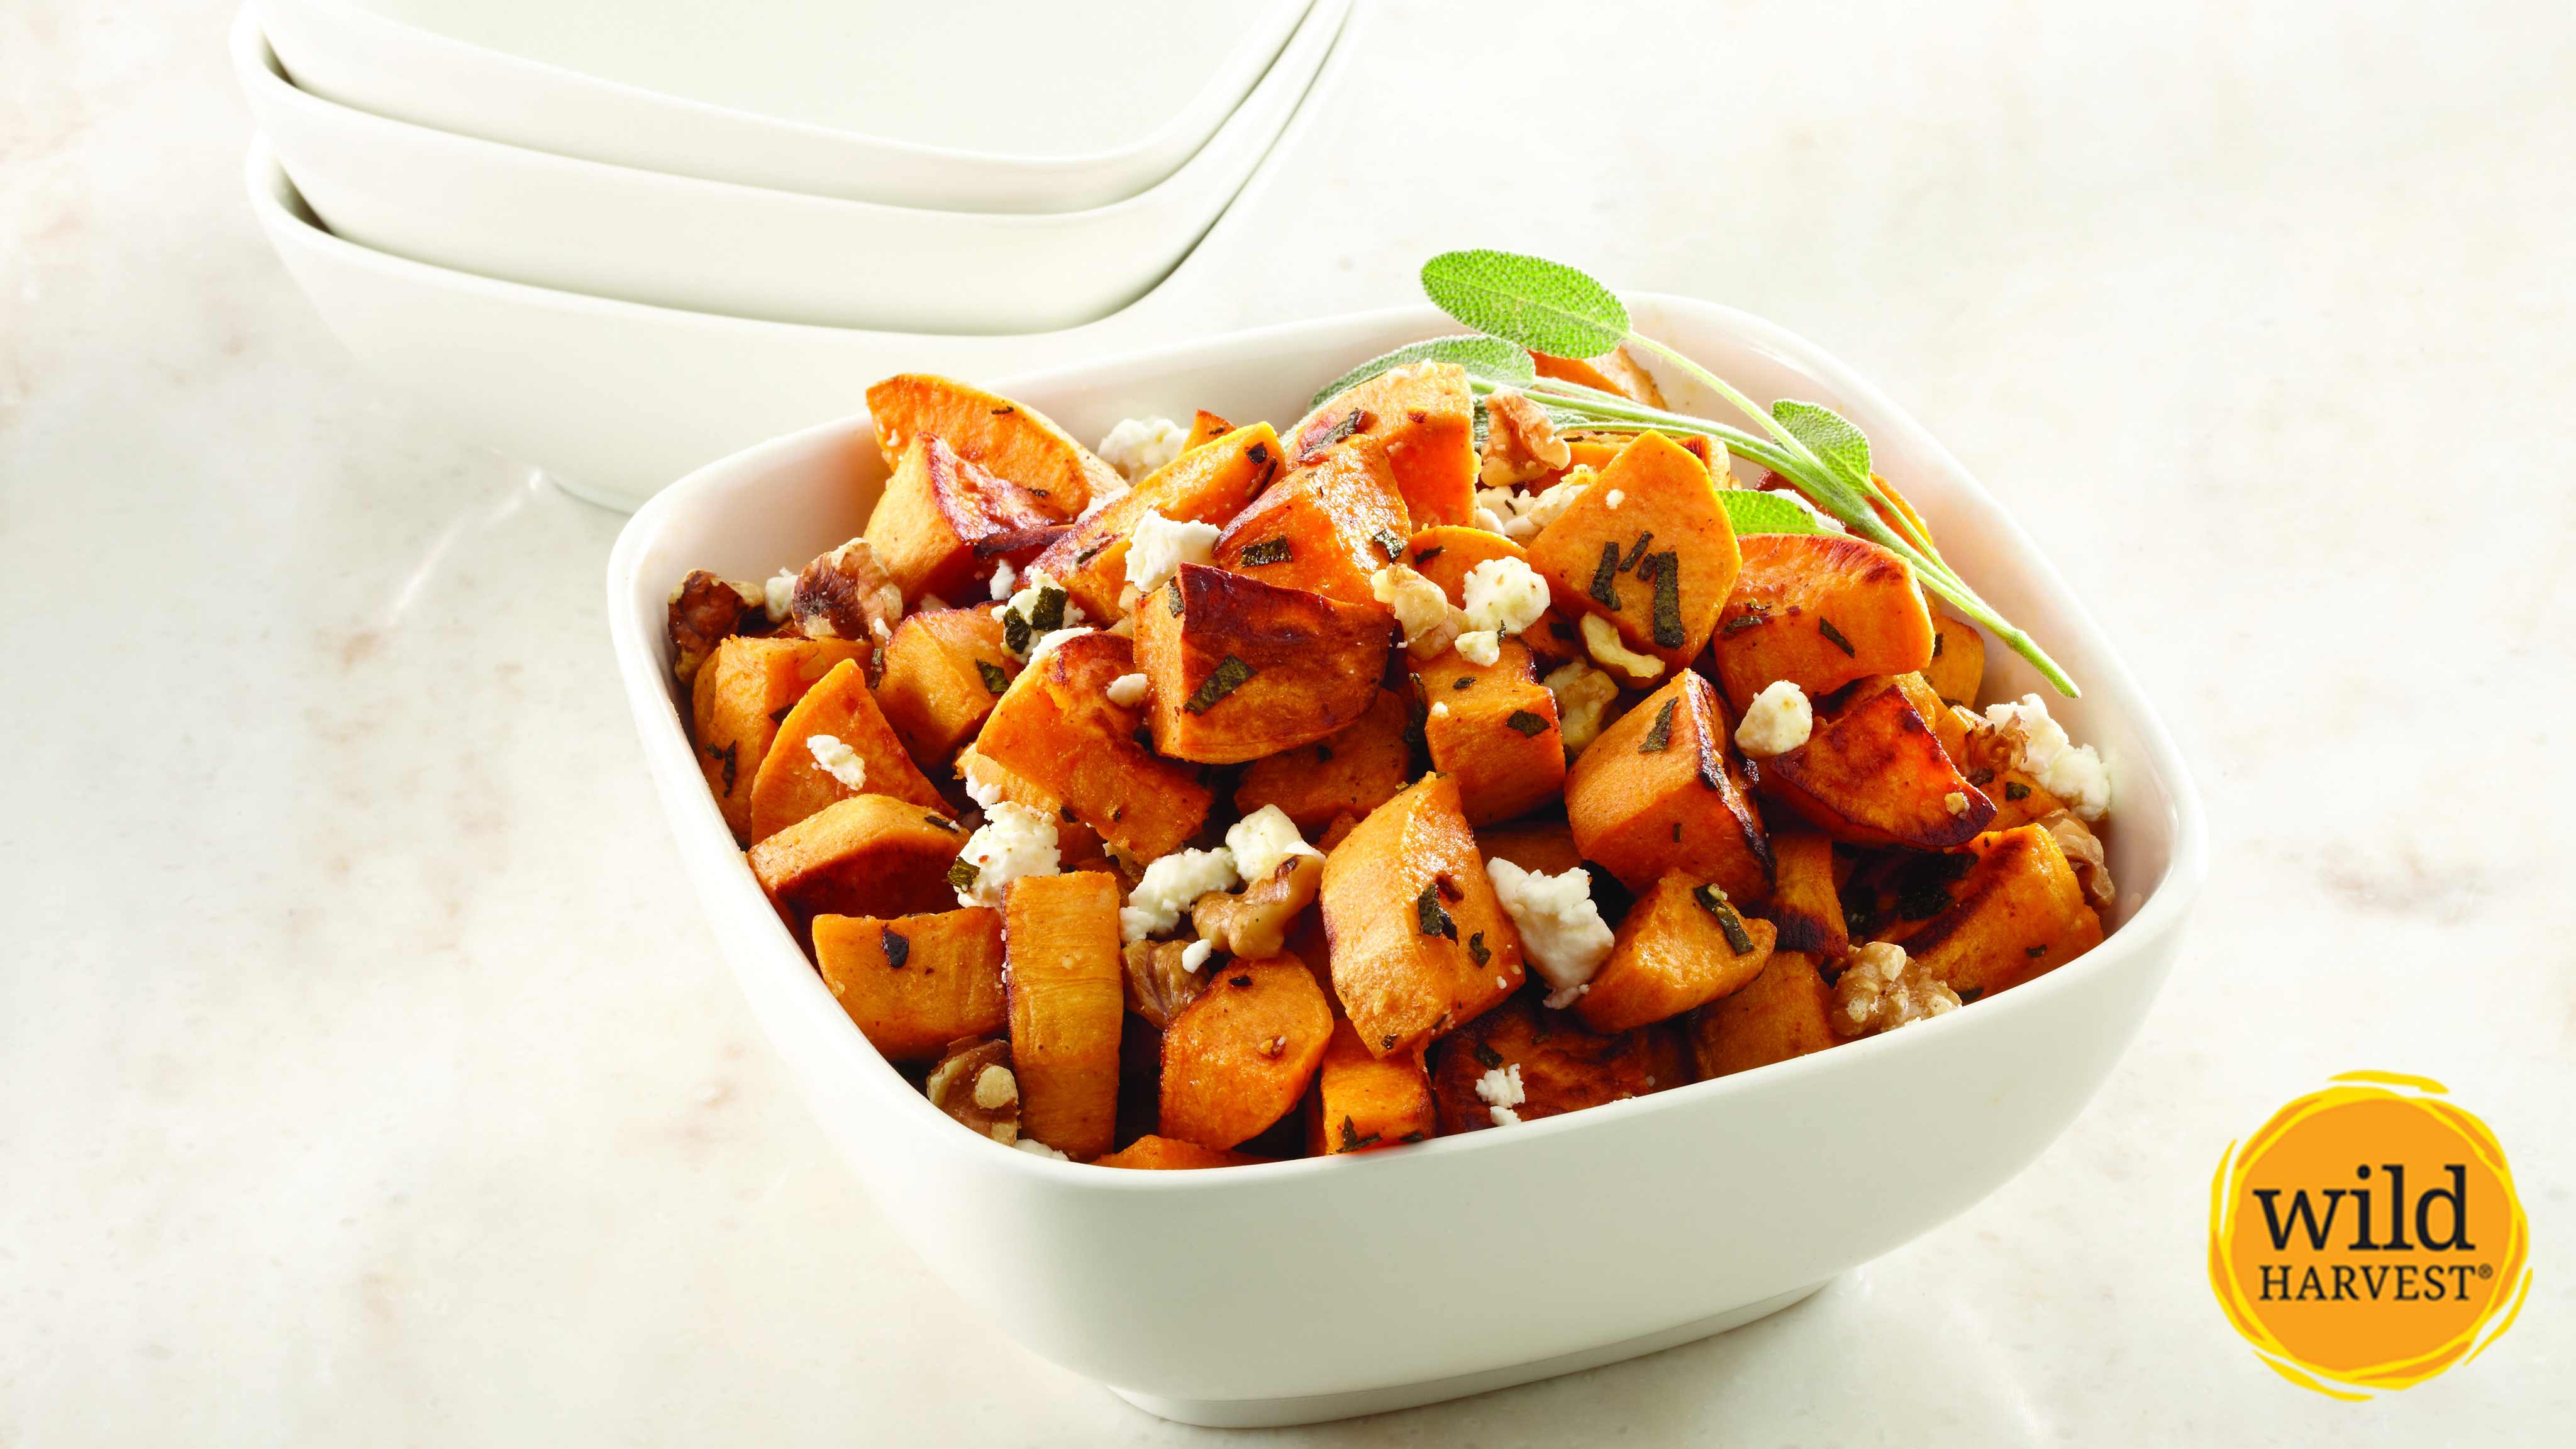 Image for Recipe Roasted Sweet Potatoes